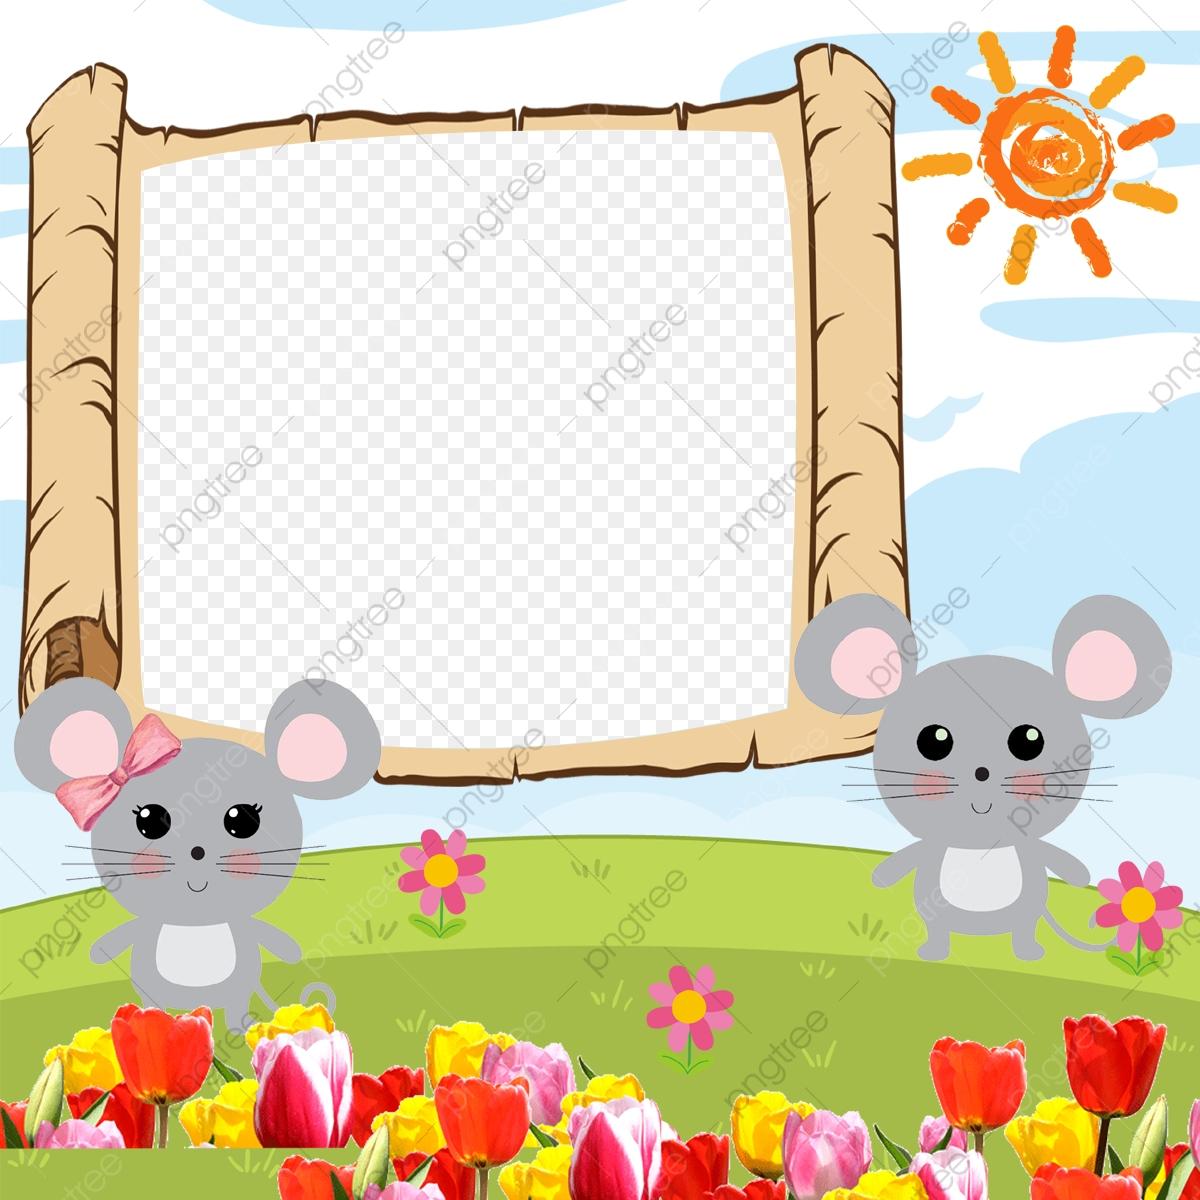 Cartoon Picture Frame, Children Frame, Flowers, Cartoon Frames PNG ... svg black and white